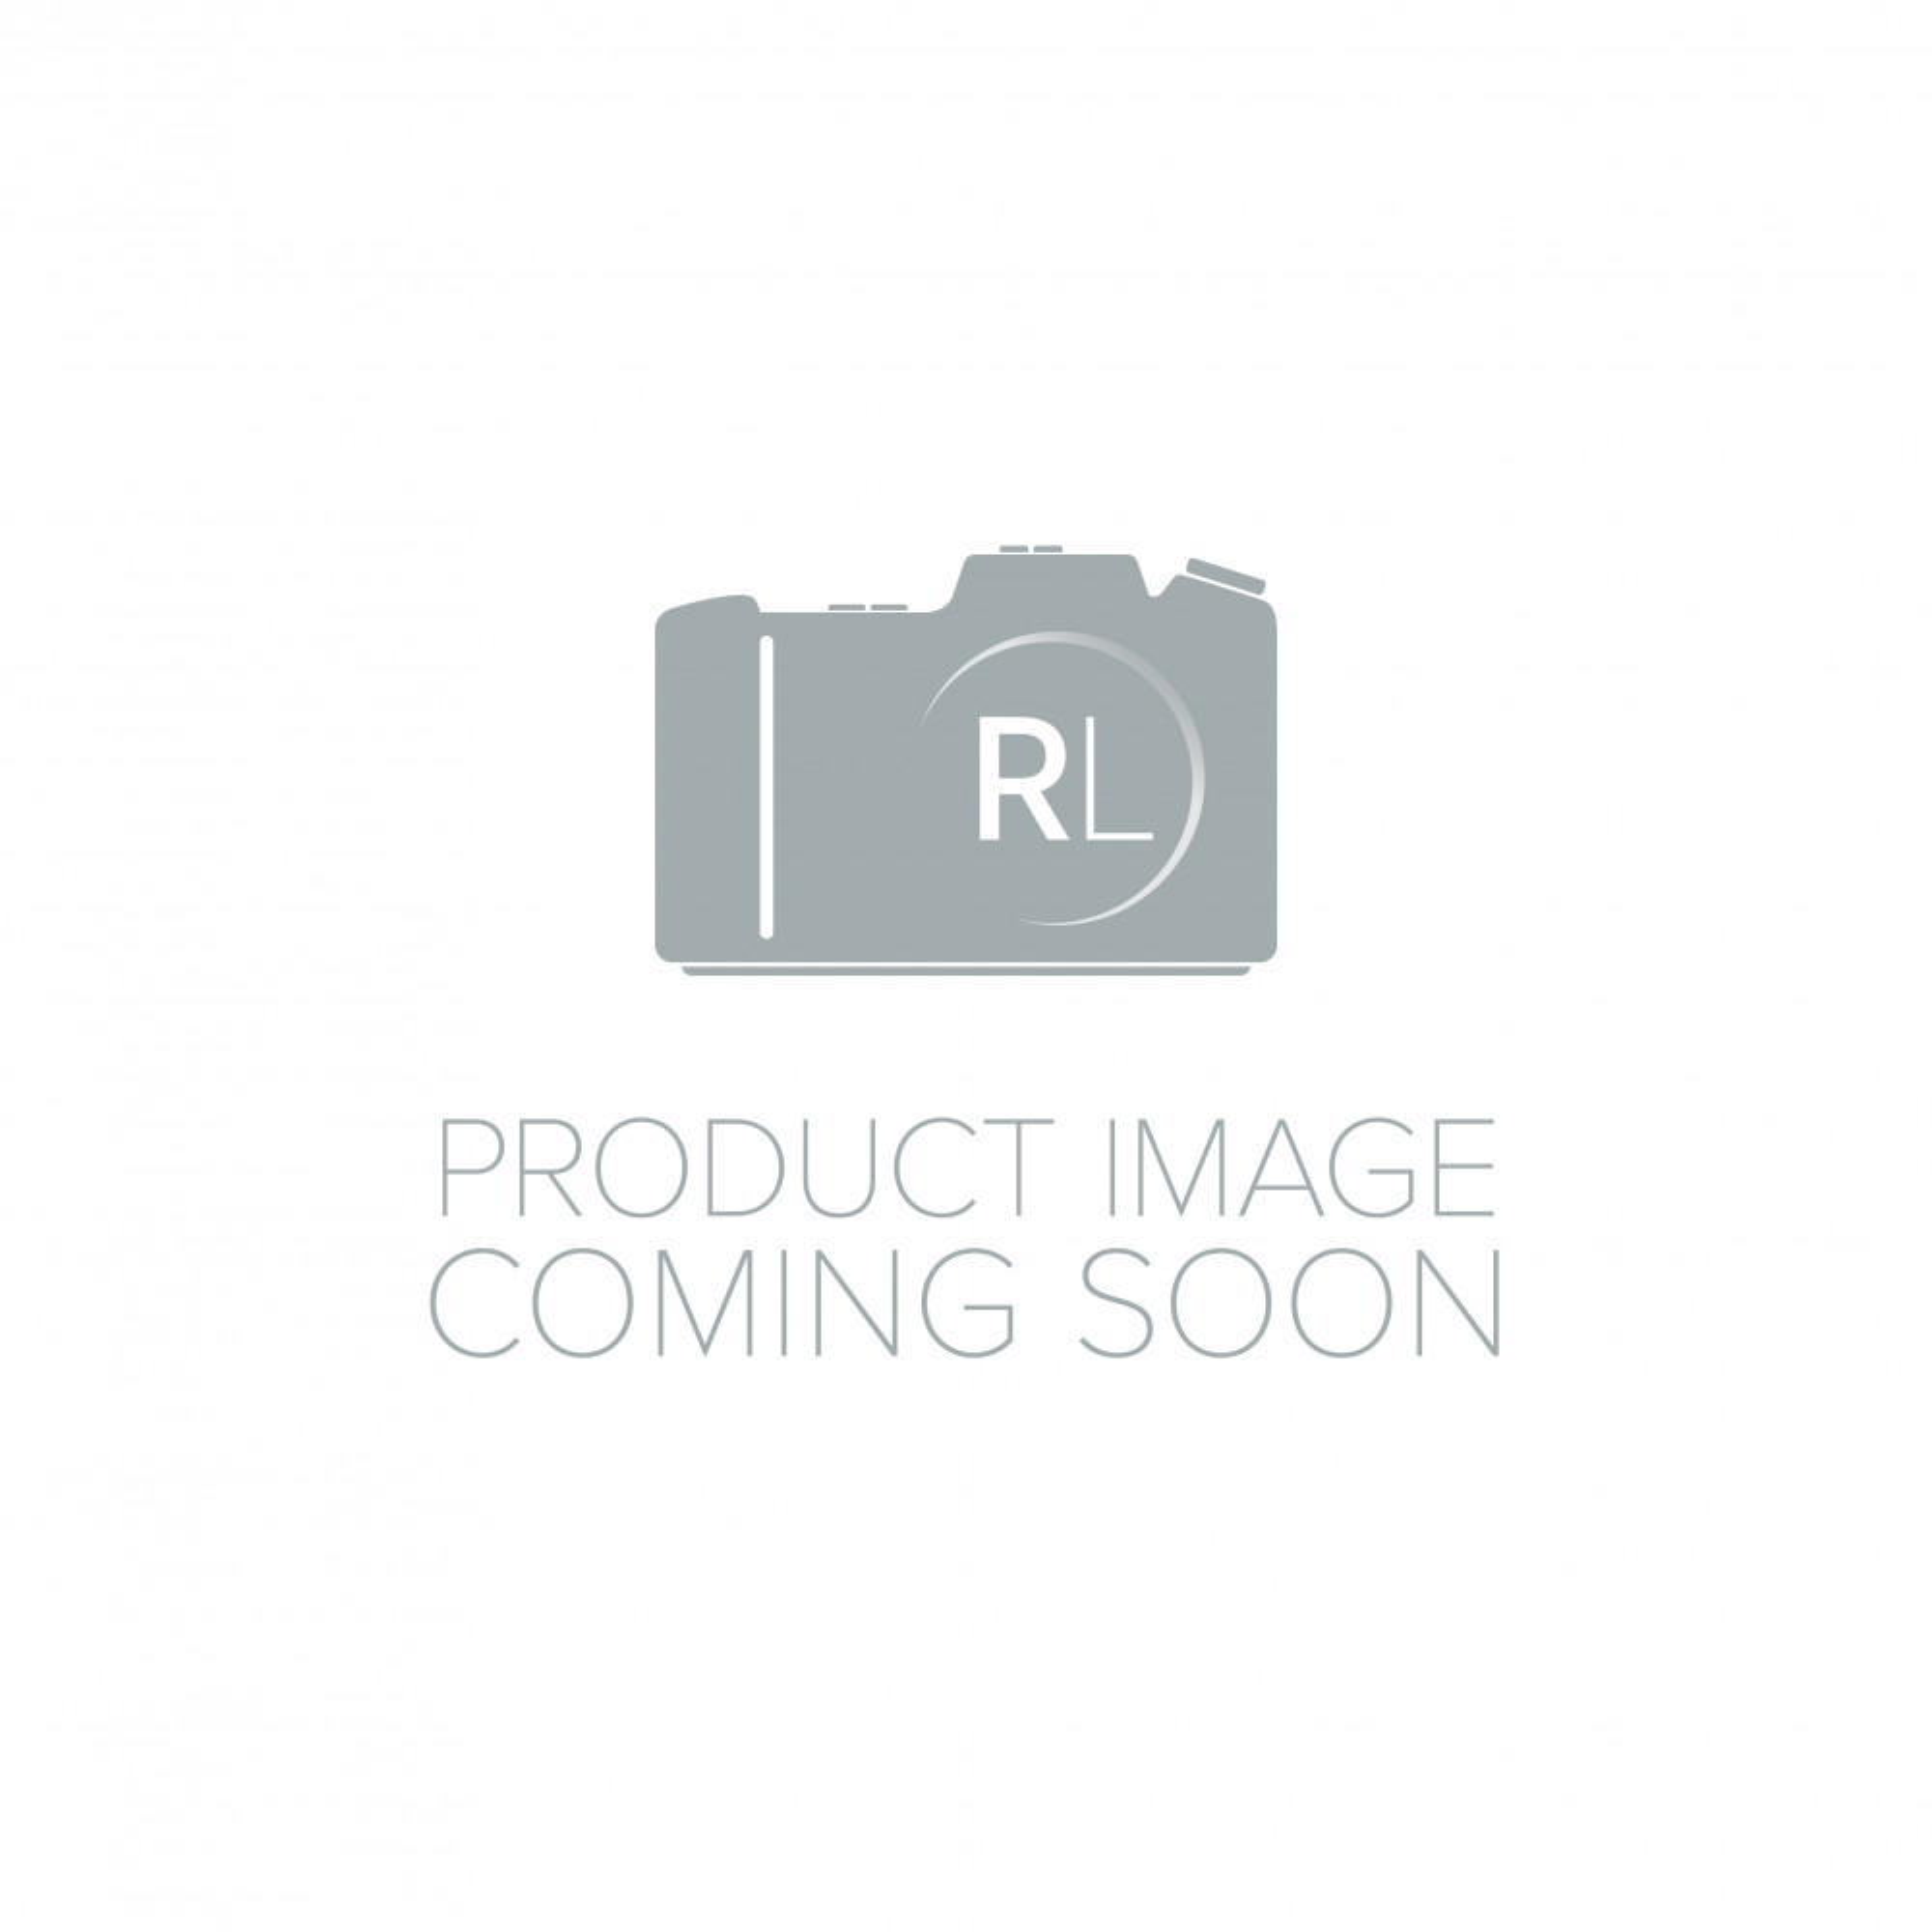 Sylvania - 16552 - 39PAR30LN/HAL/WFL50/DL/120V